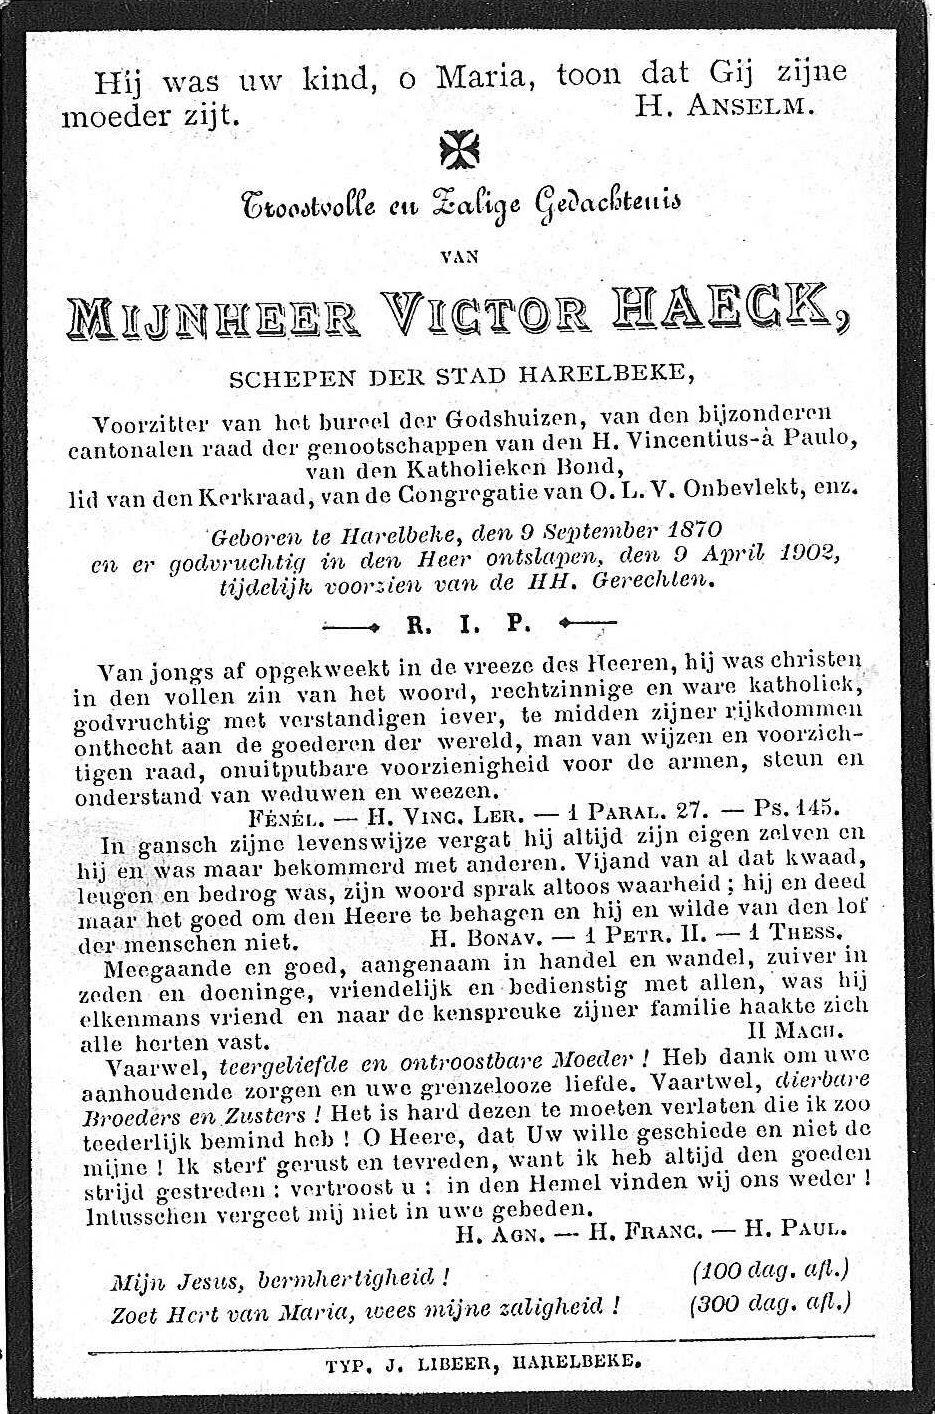 Victor-(1902)-20121011164607_00021.jpg